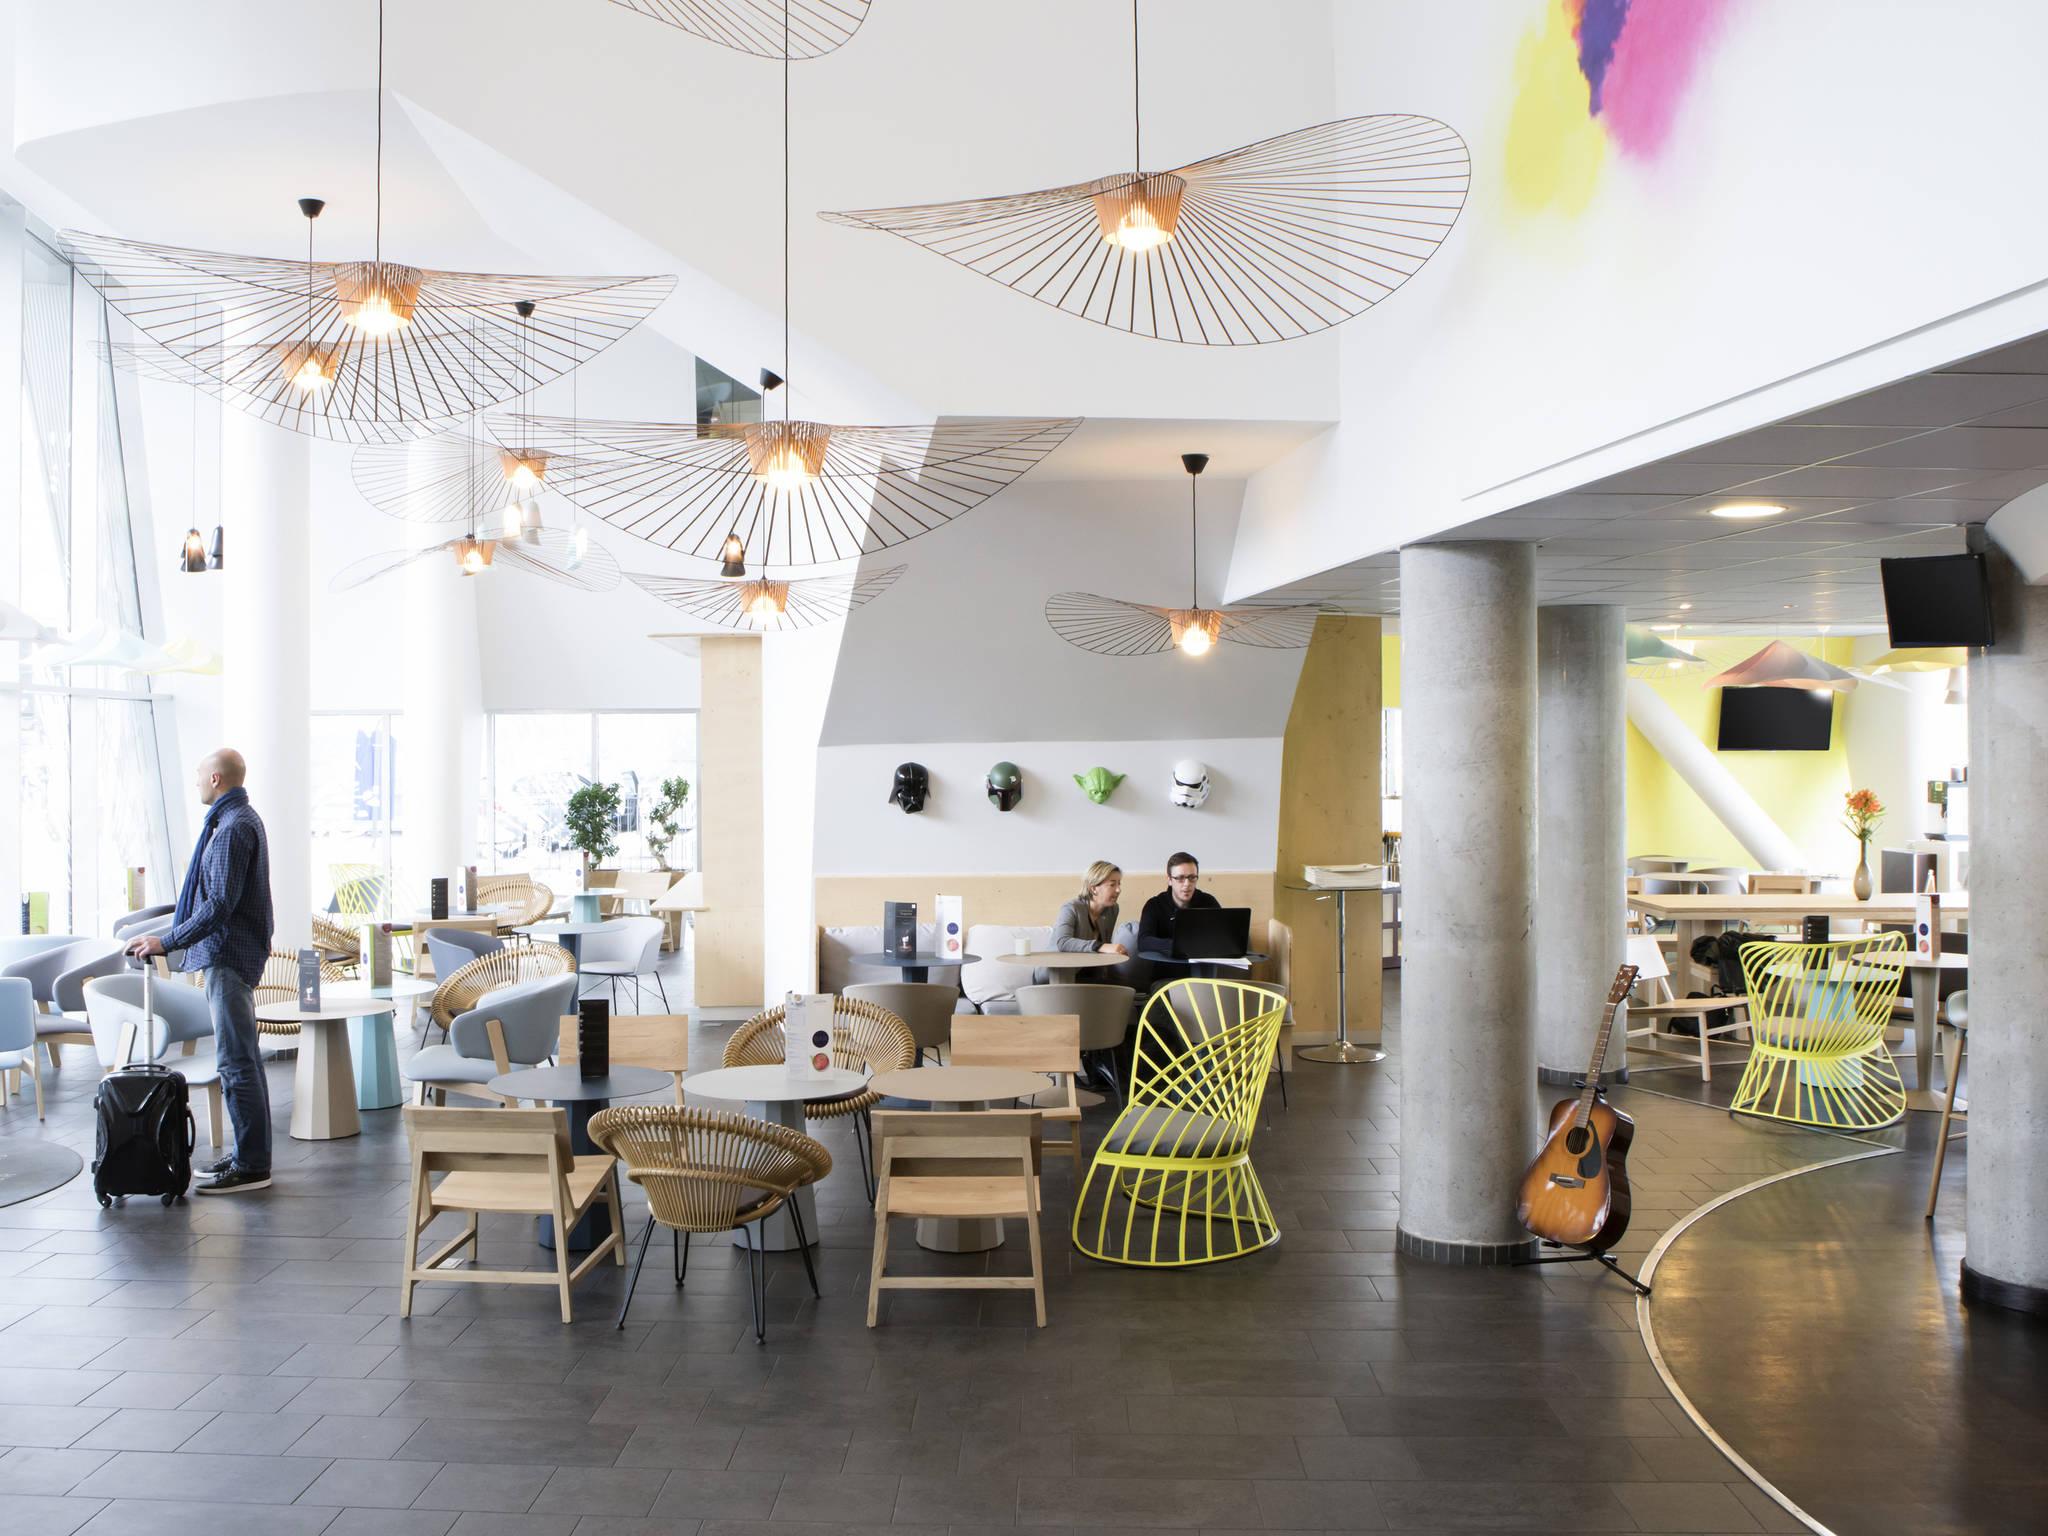 Hotel – Novotel Suites Gare Lille Europe